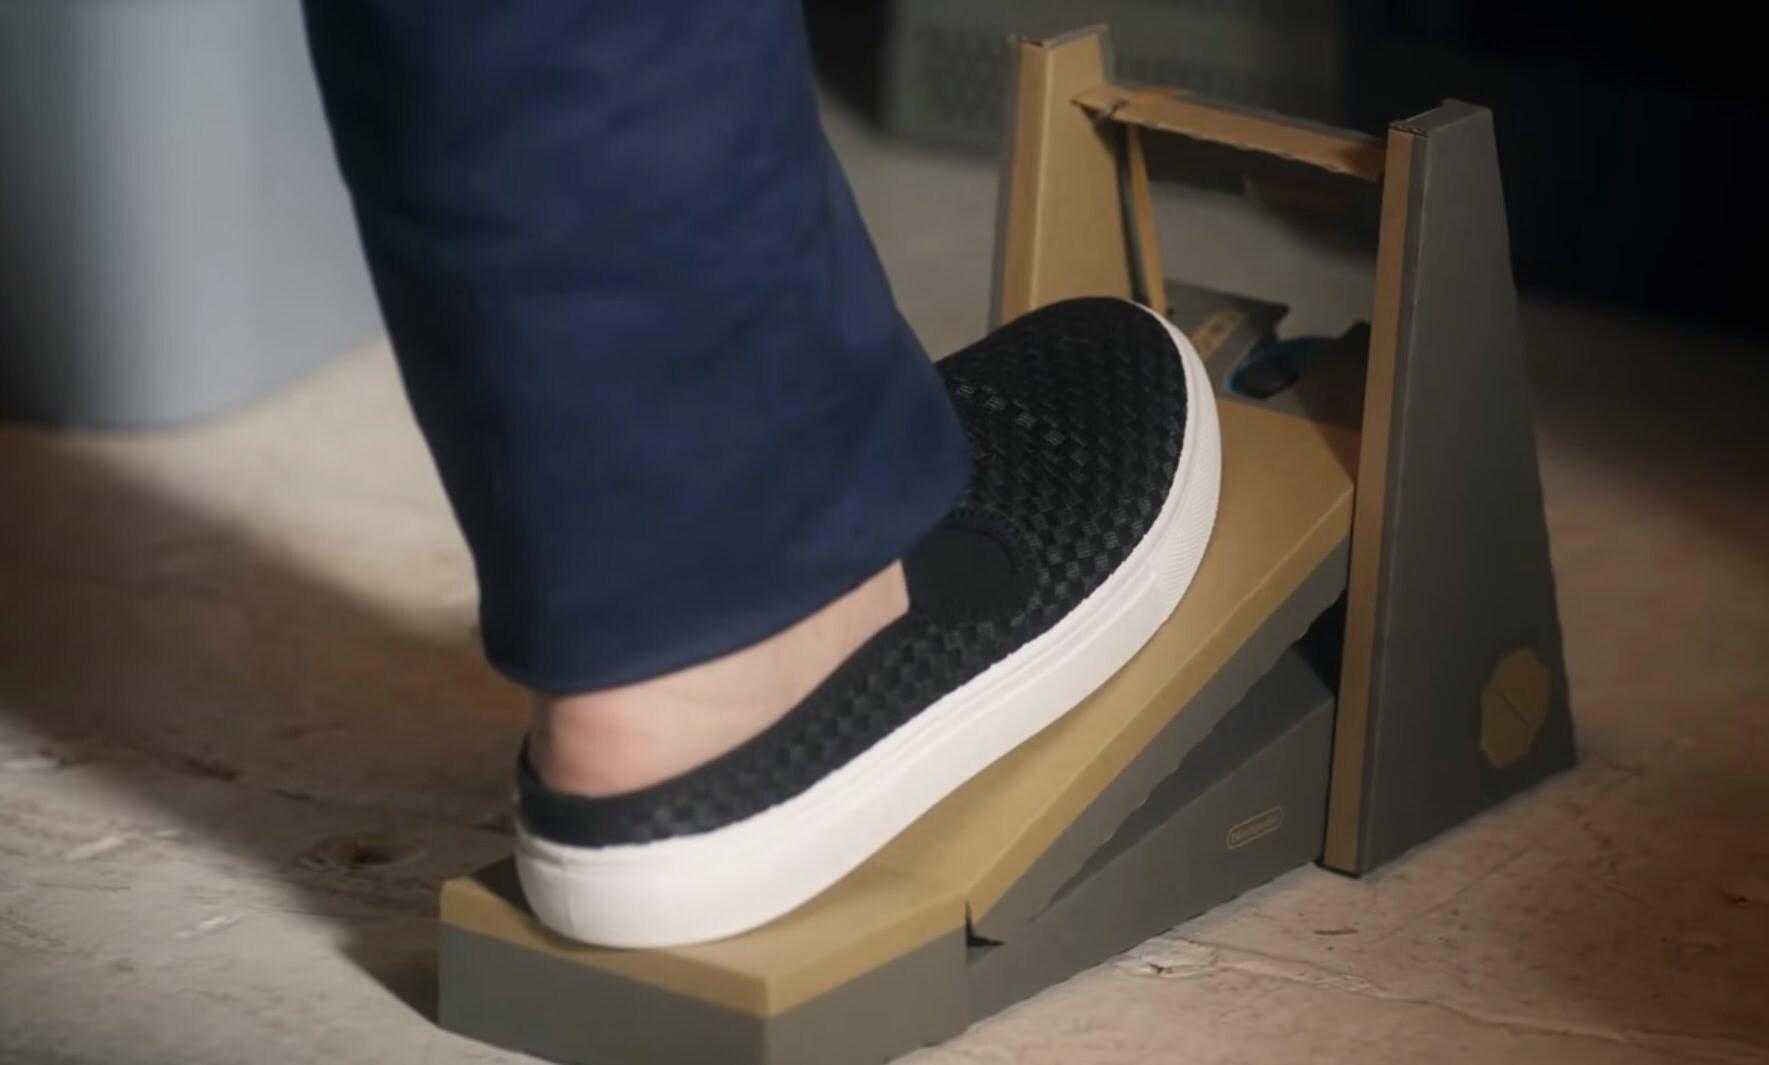 voetpedaal Nintendo Labo voertuigen